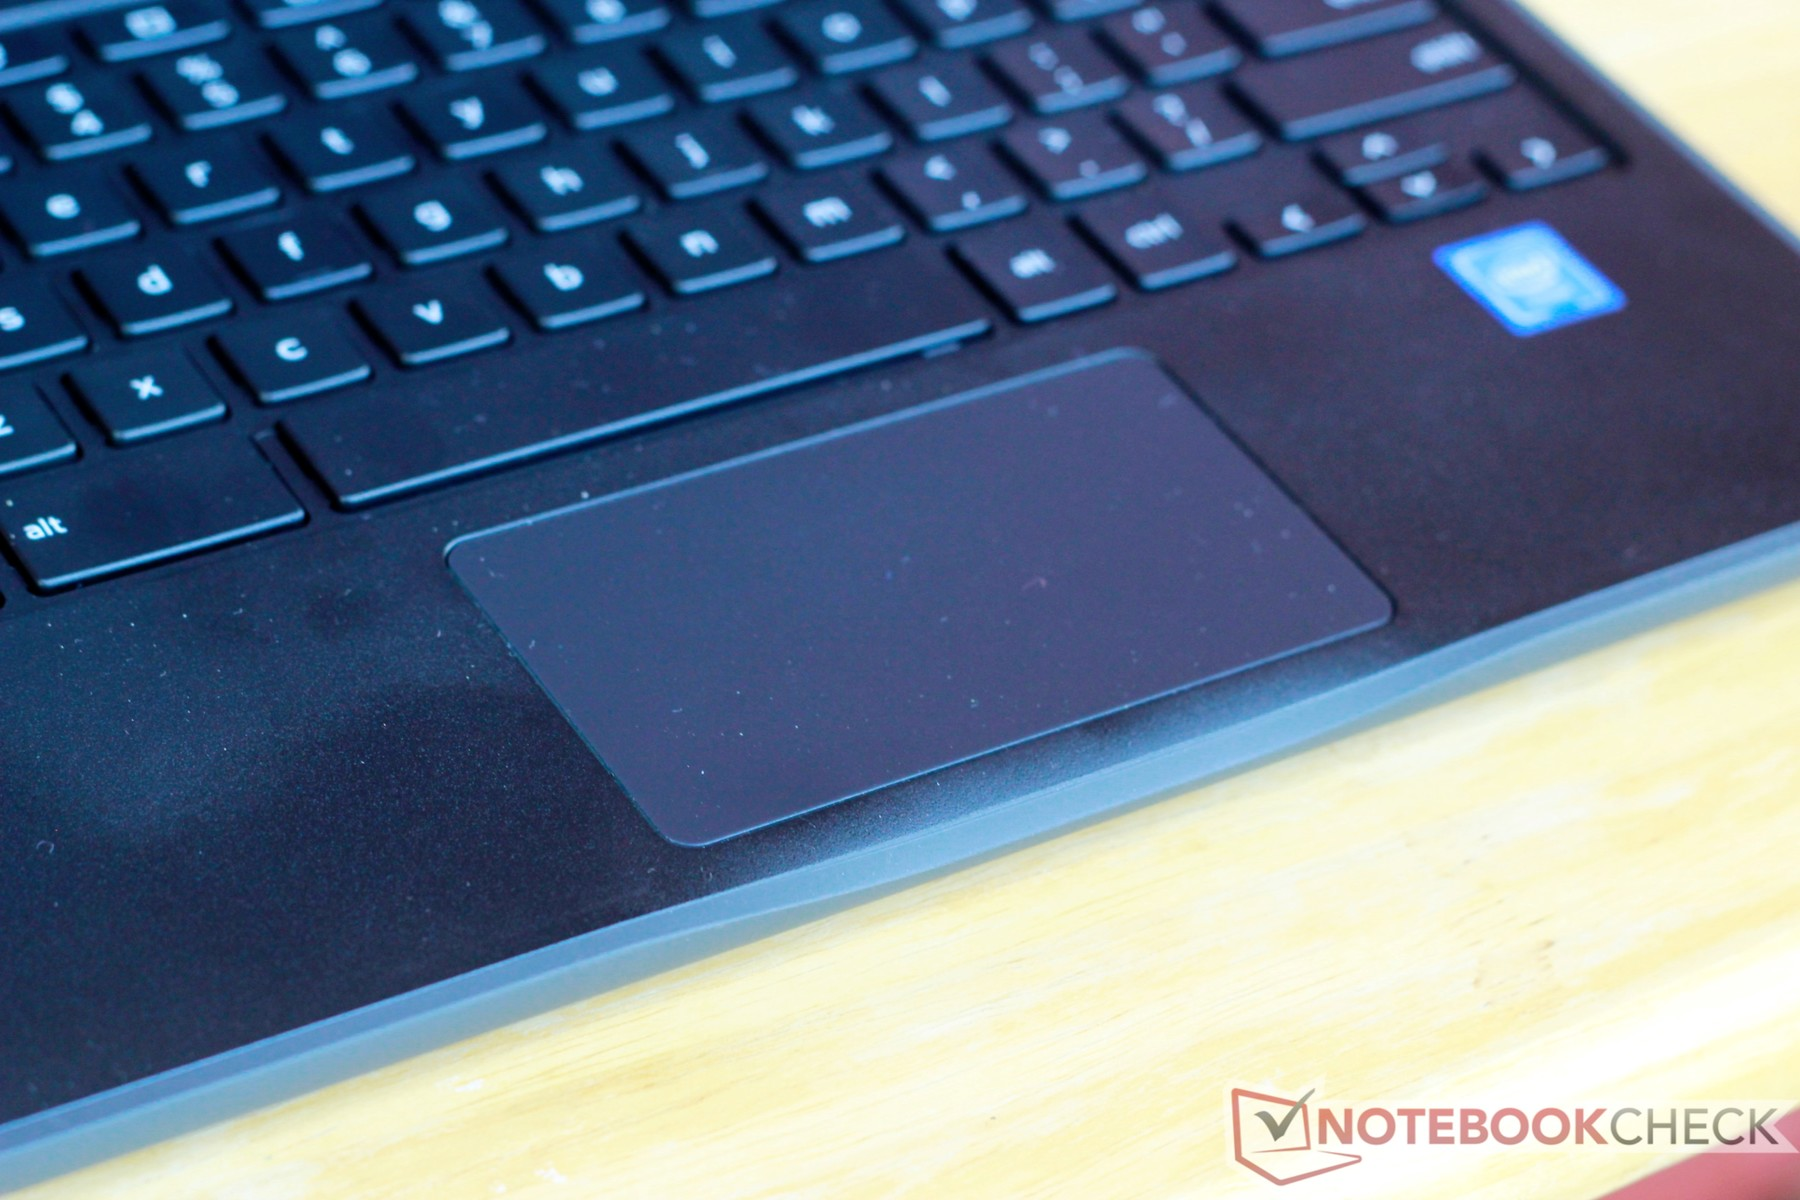 Dell Chromebook 11 3181 (Celeron N3060) Laptop Review